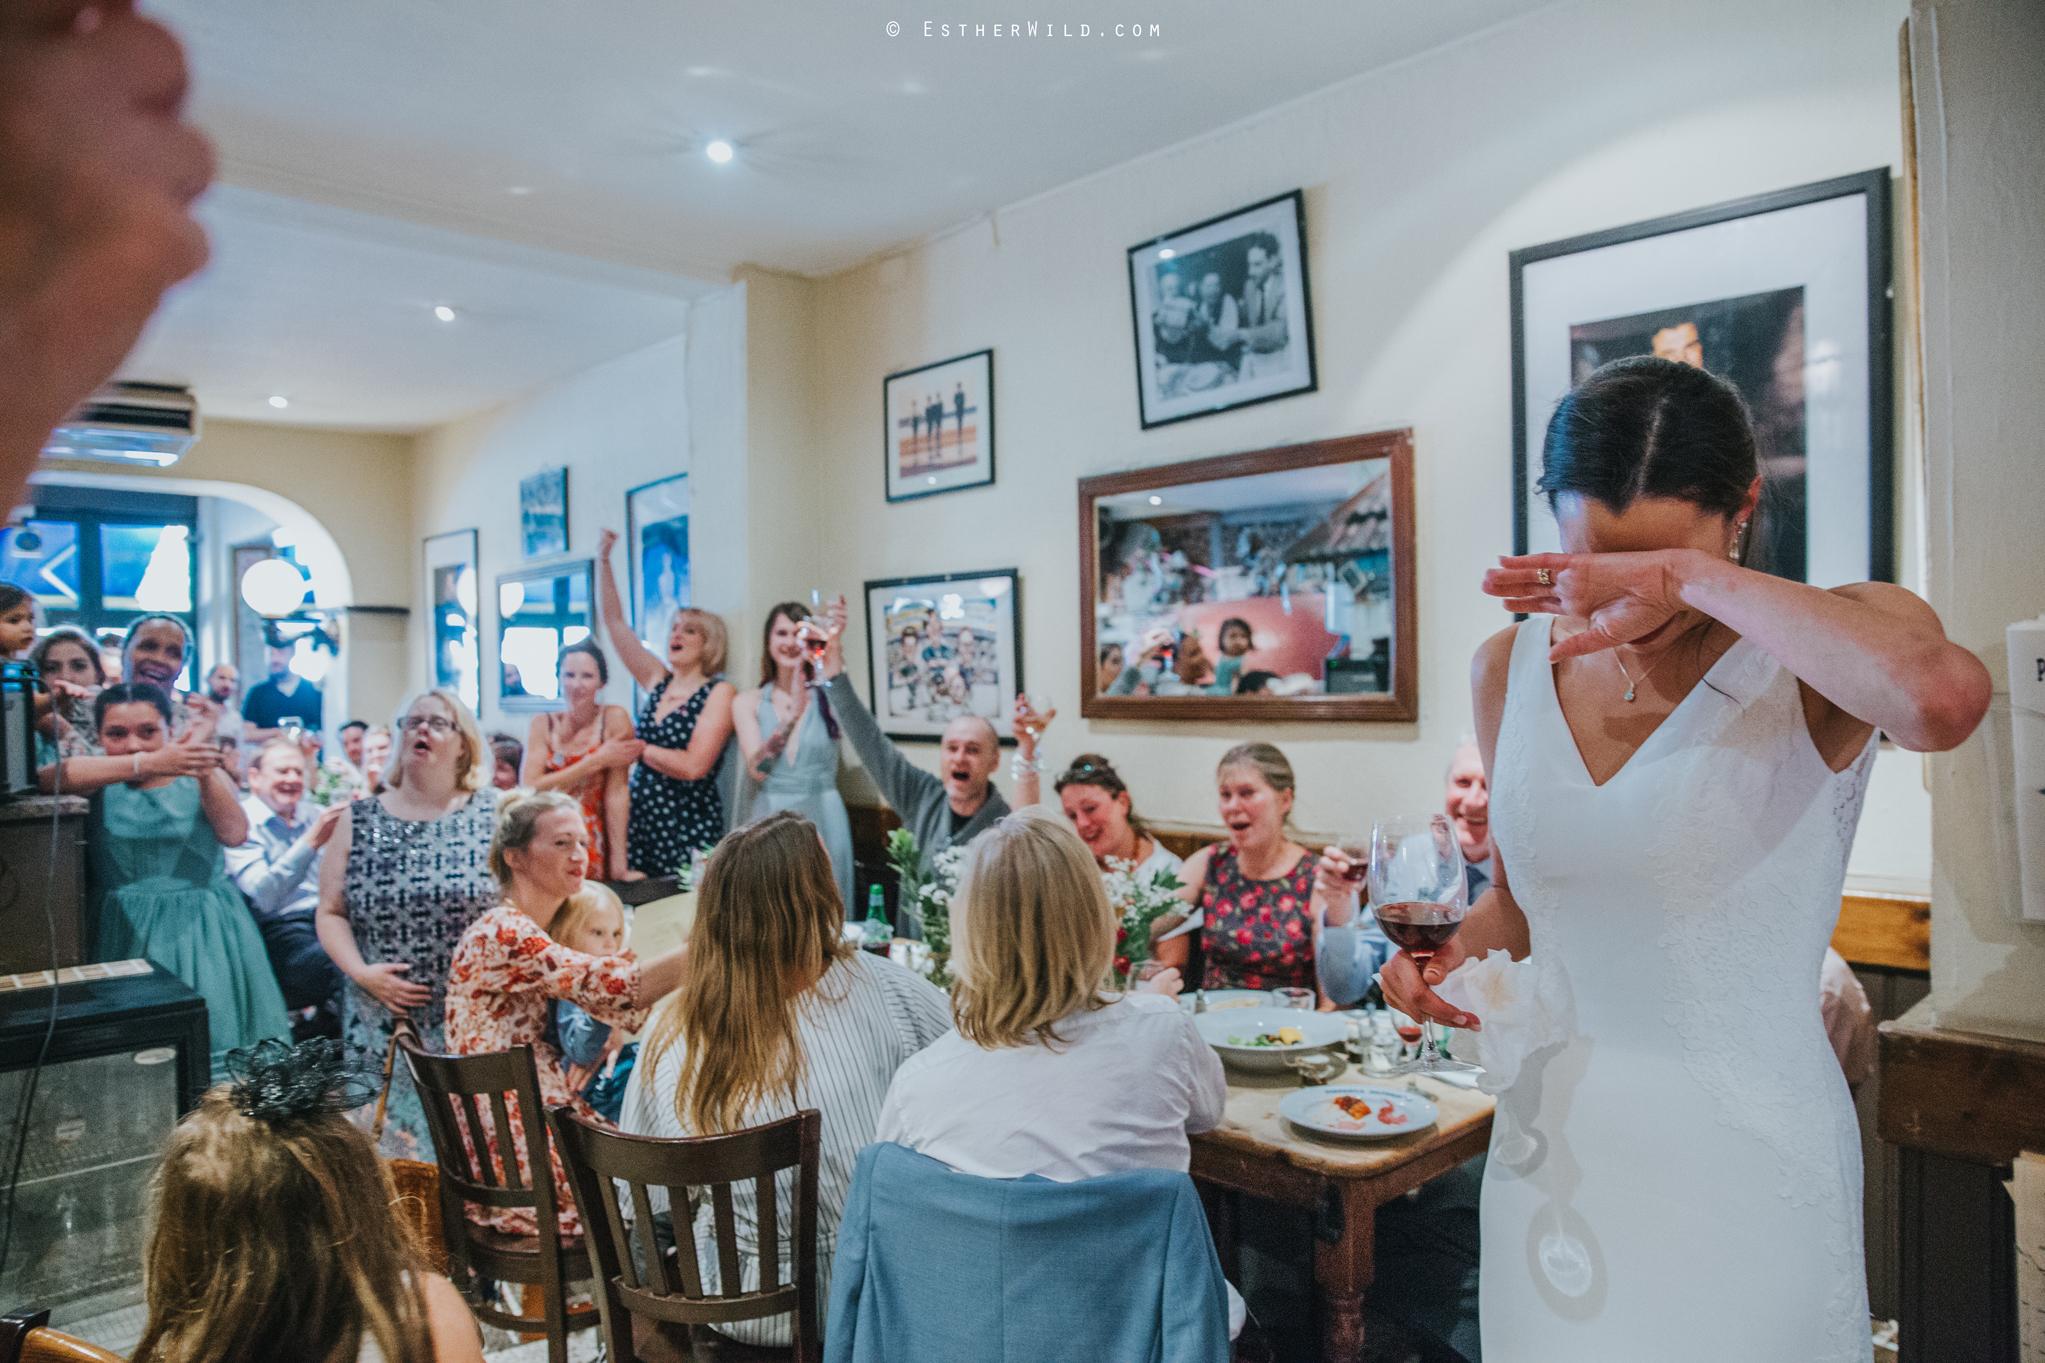 Islington_Town_Hall_Wedding_London_Photographer_Esther_Wild_IMG_5971.jpg